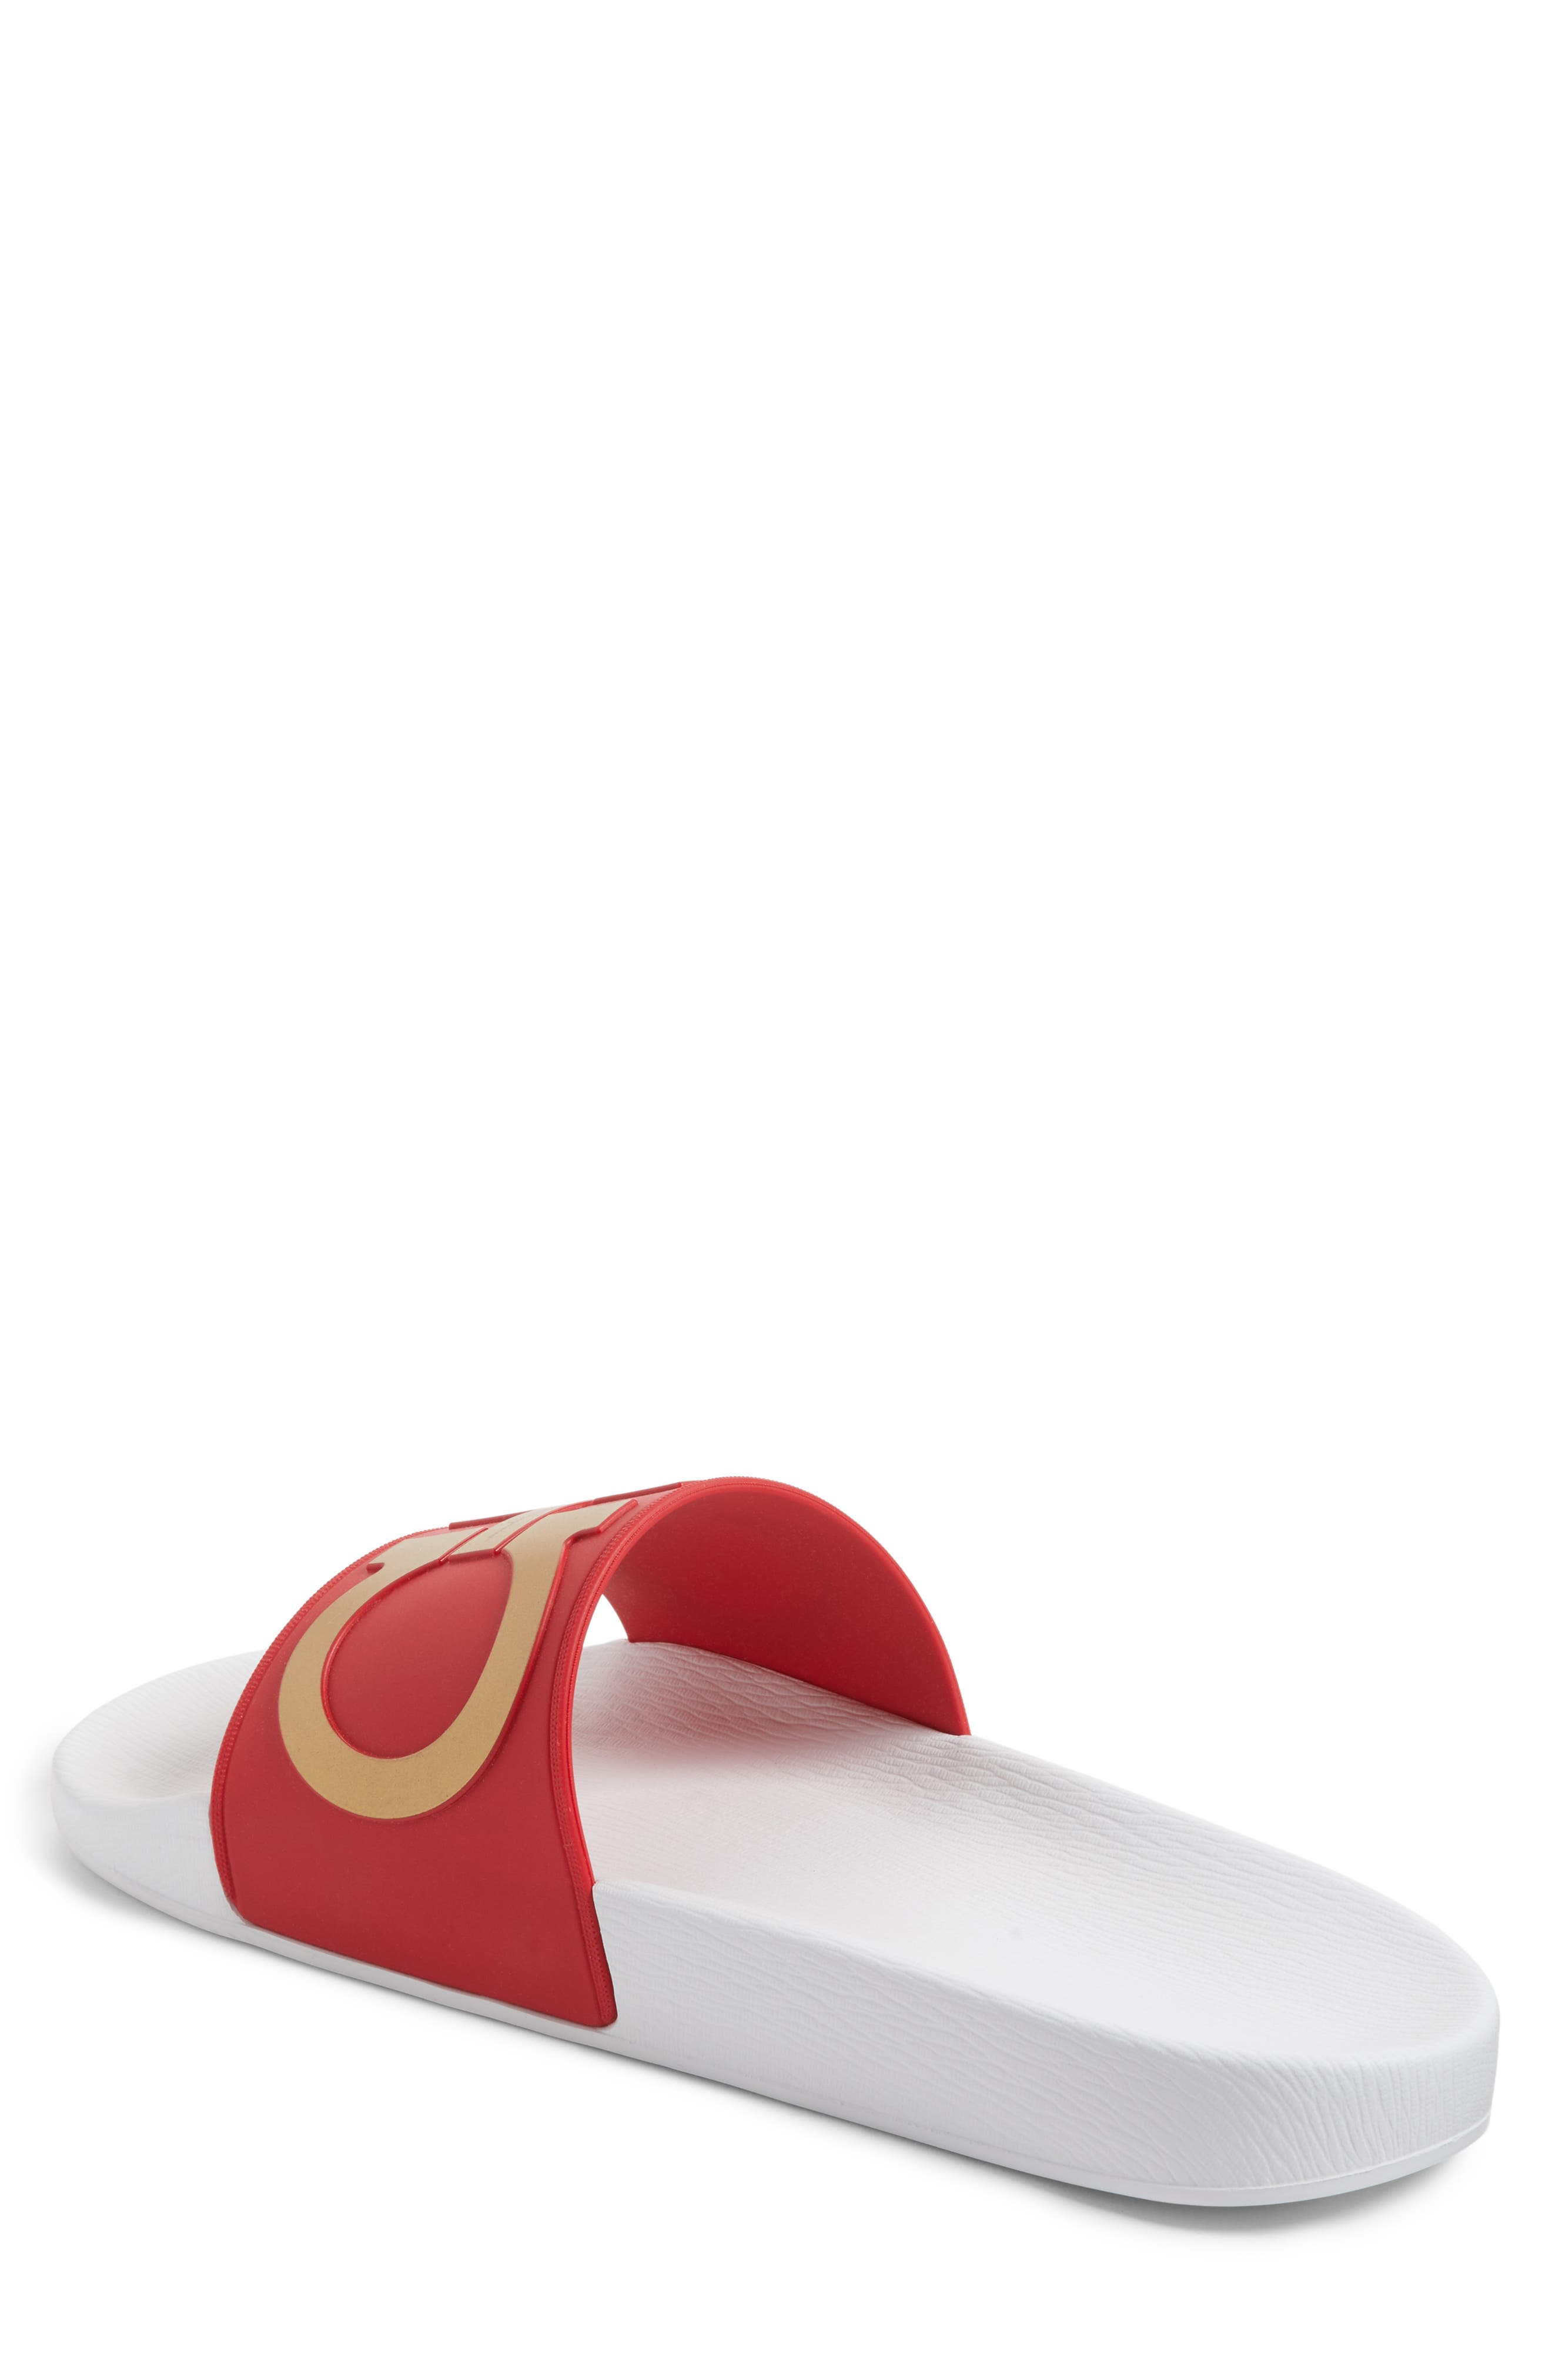 Alternate Image 2  - Salvatore Ferragamo 'Groove' Slide Sandal (Men)